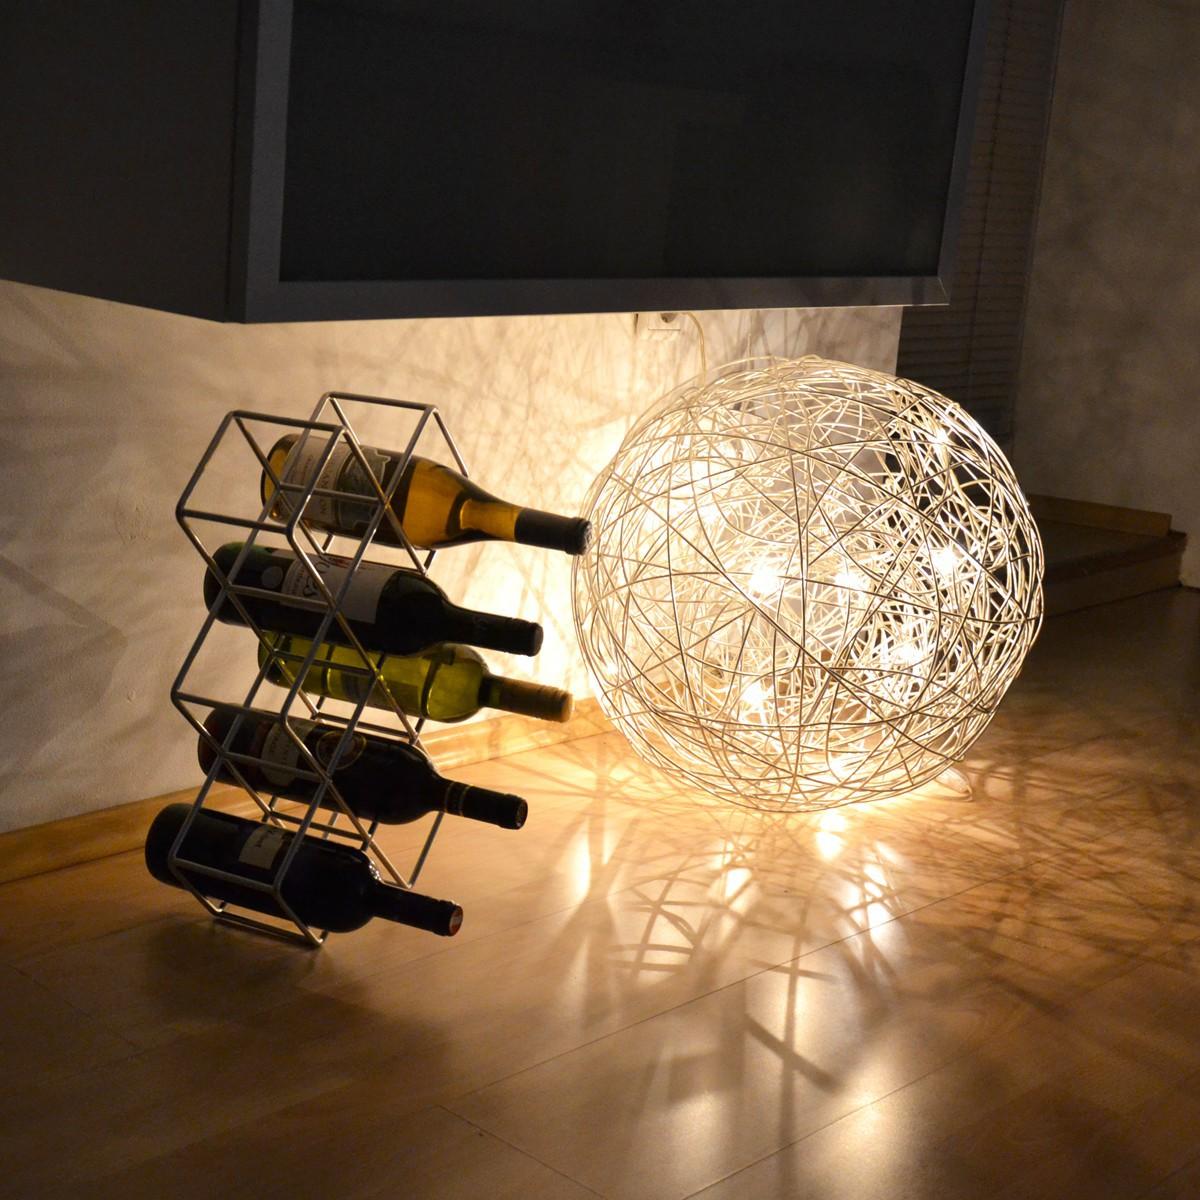 s luce mesh led drahtkugel stehlampe 50 cm bodenleuchte stehleuchte kaufen bei licht design. Black Bedroom Furniture Sets. Home Design Ideas